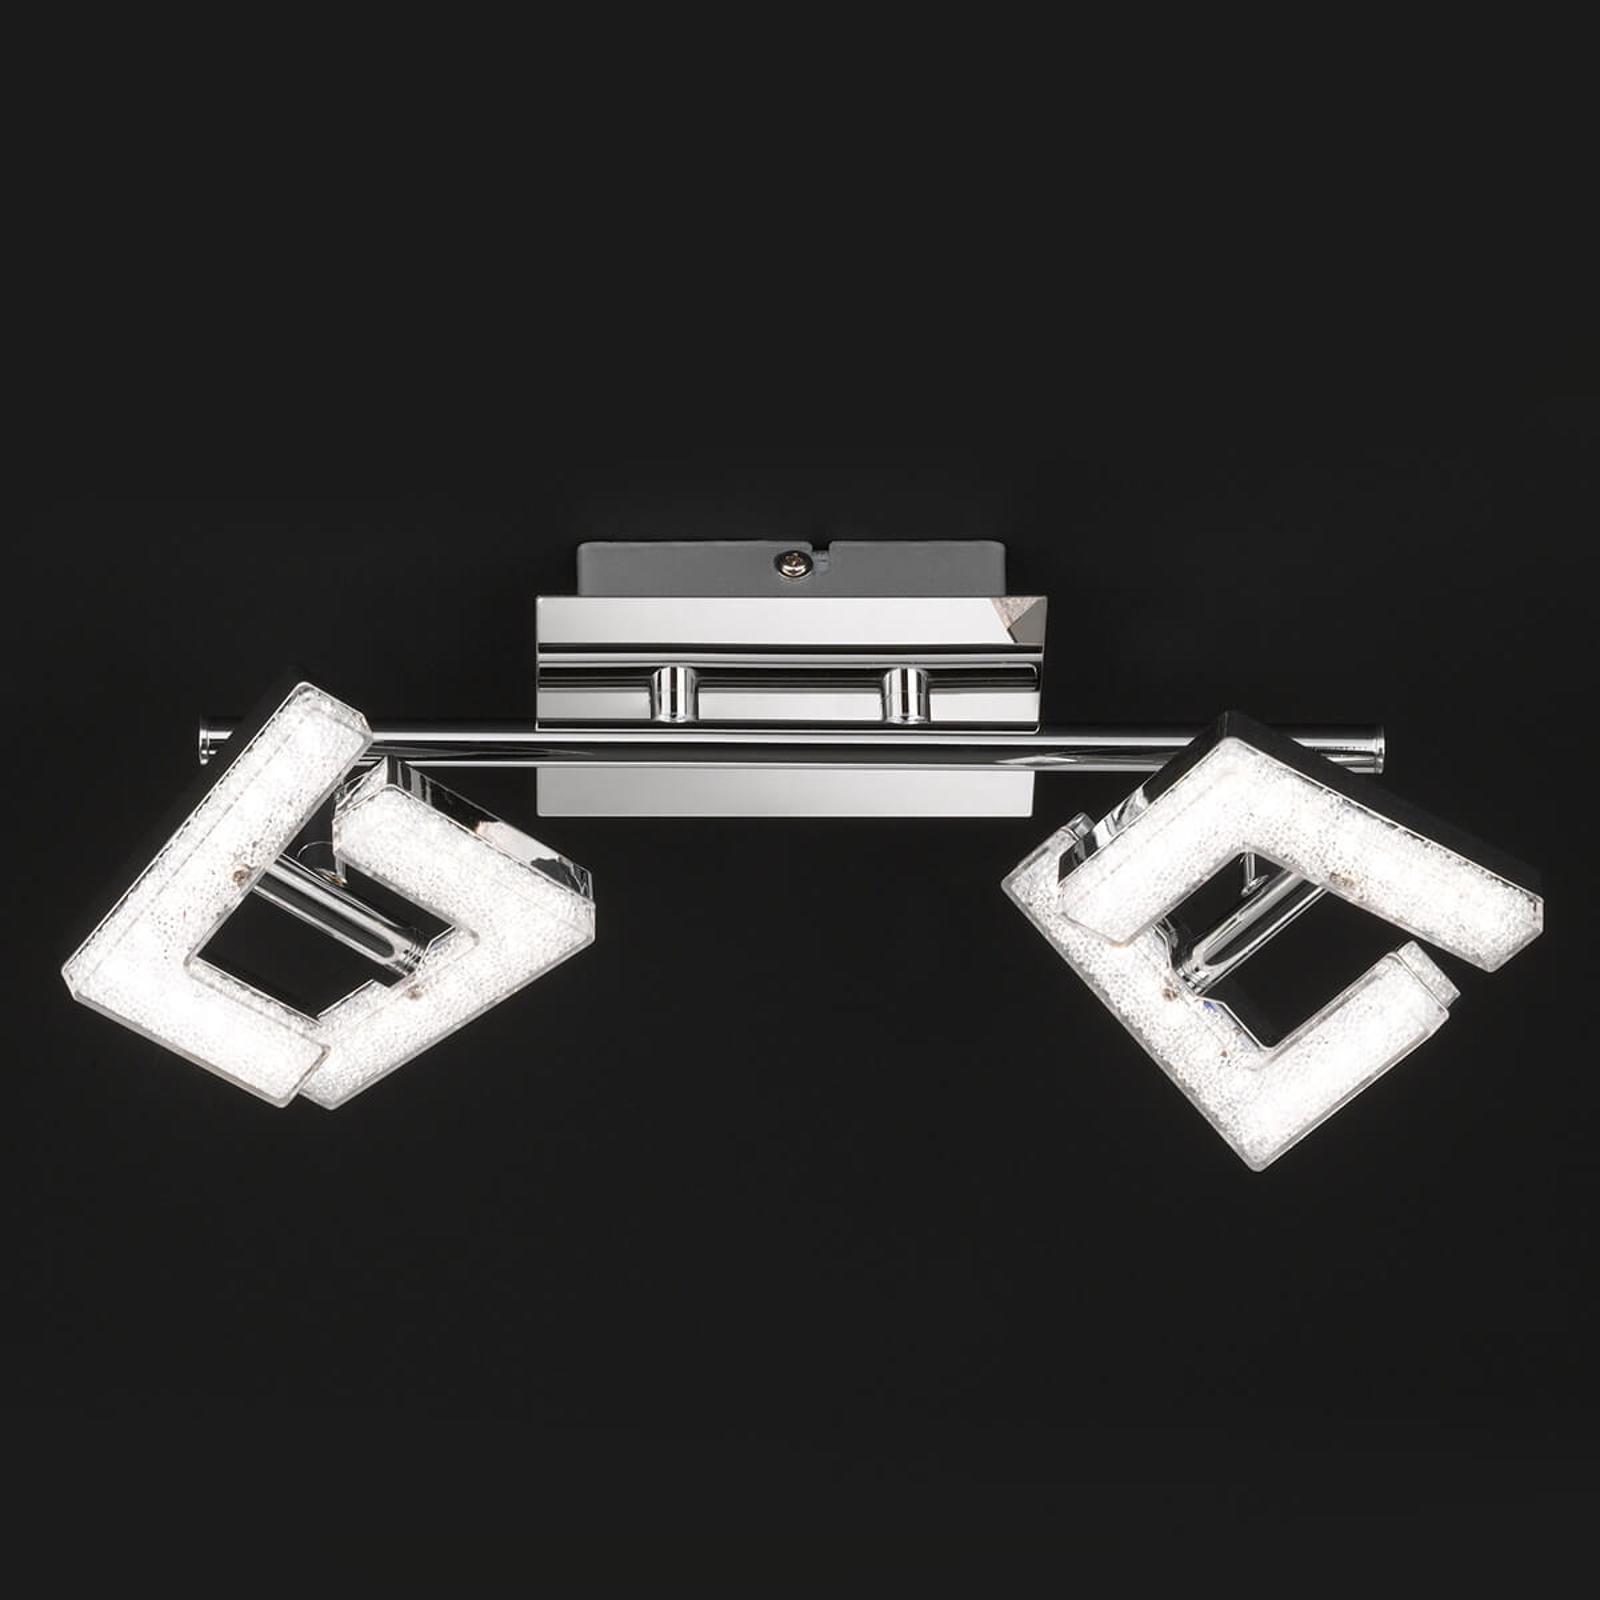 Instelbare LED plafondlamp Lea m. kristaleffect